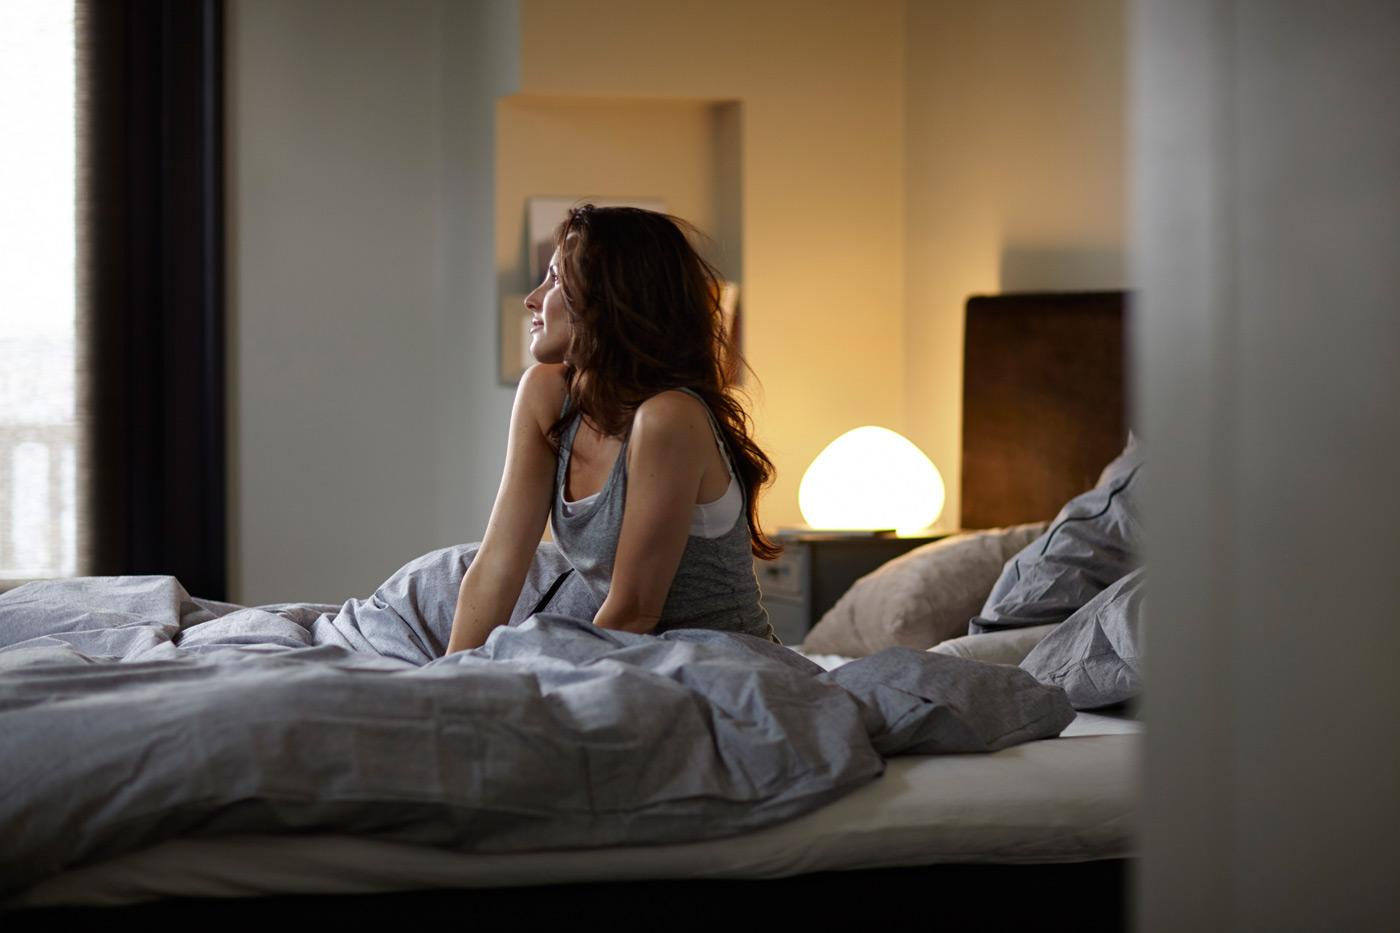 Philips' latest Hue lights help you sleep